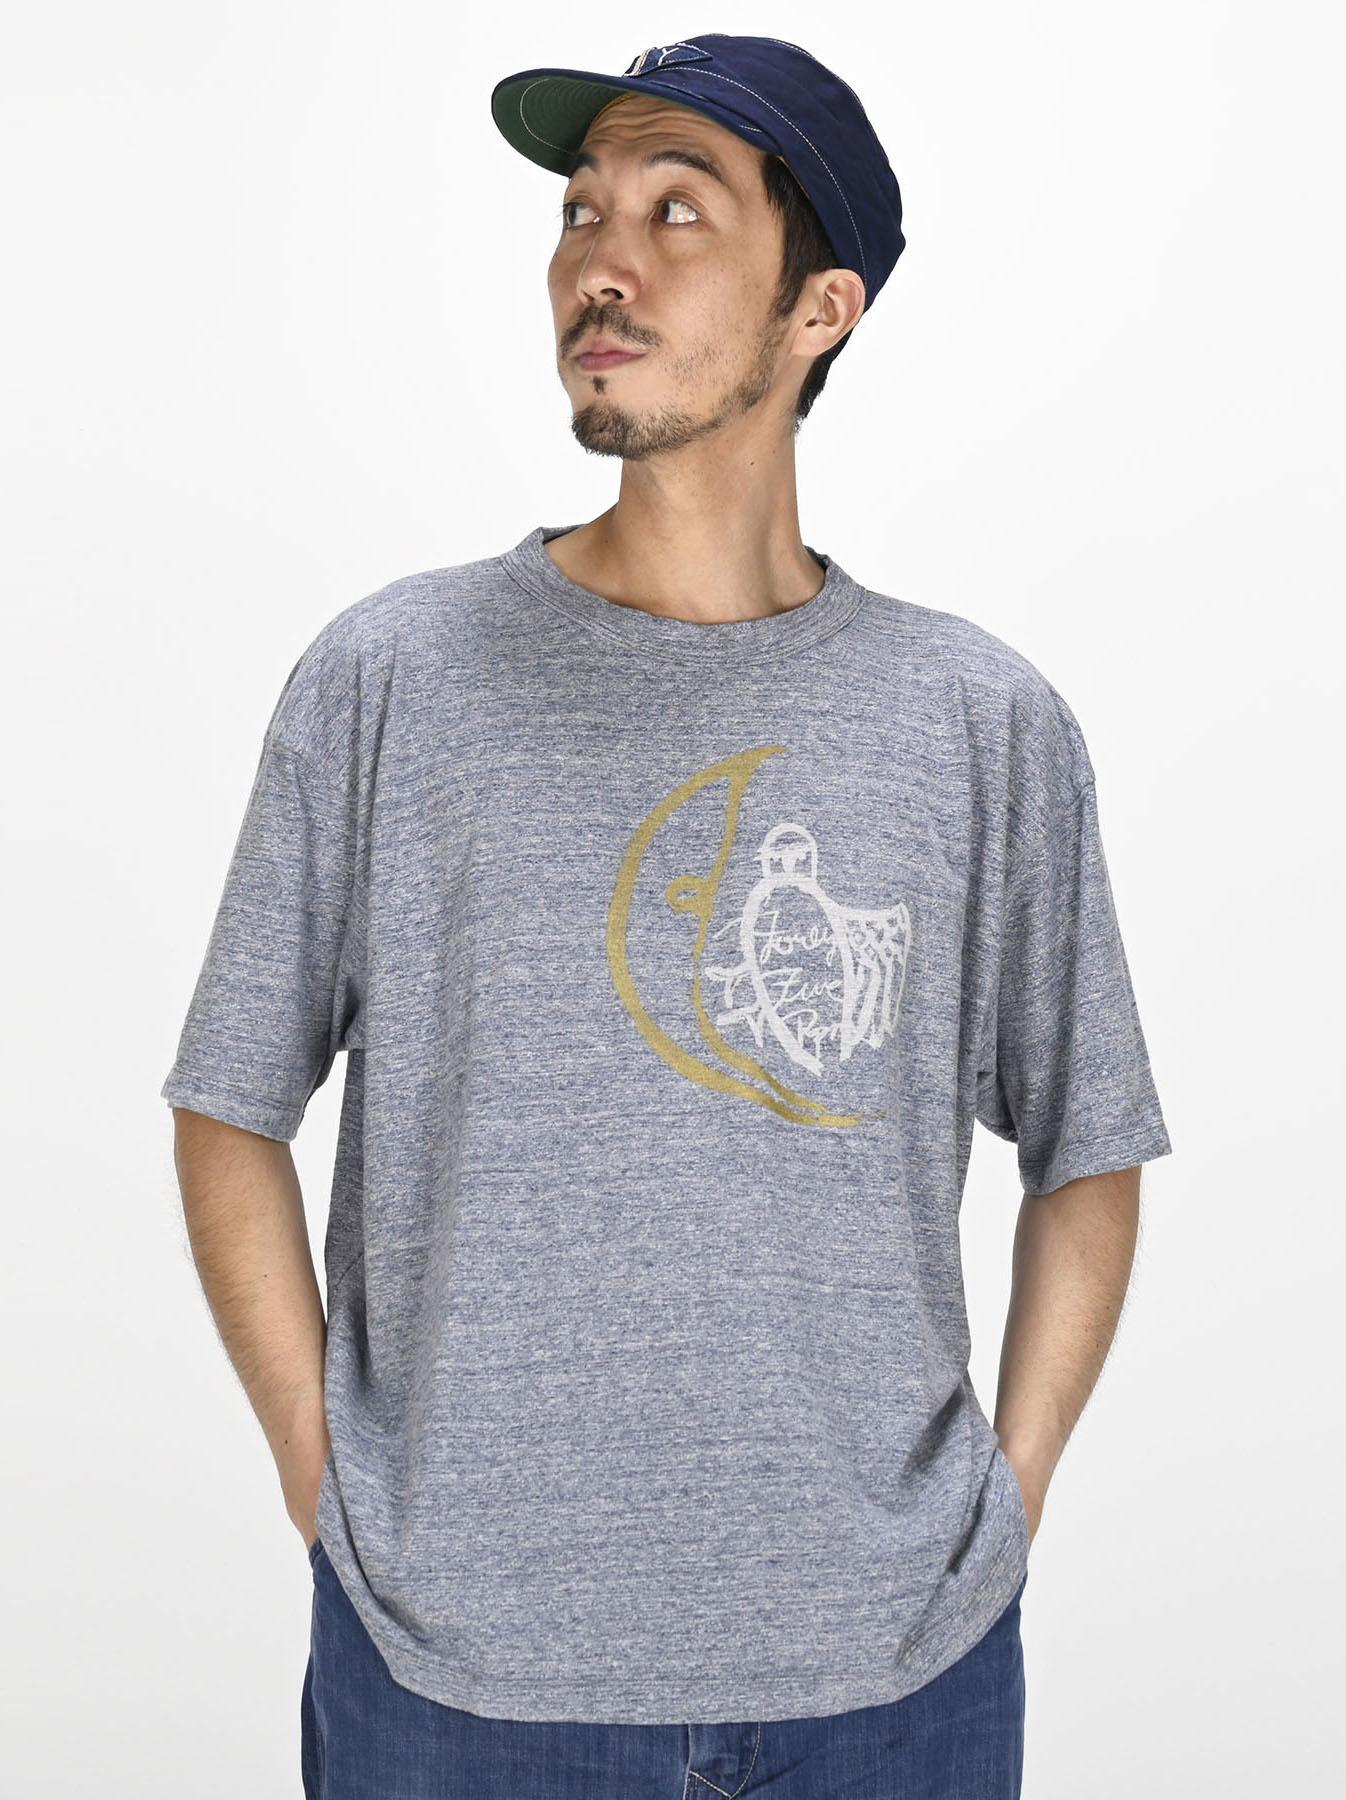 Top Sumite de Owl T-shirt-2